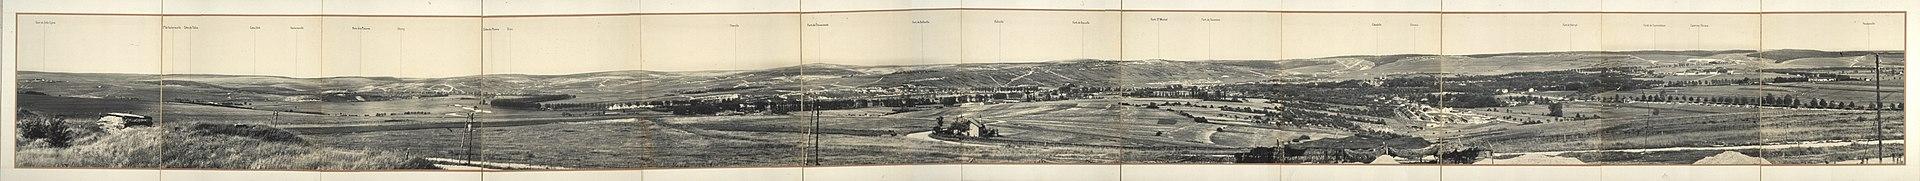 Panorama de Verdún desde Fort de la Chaume